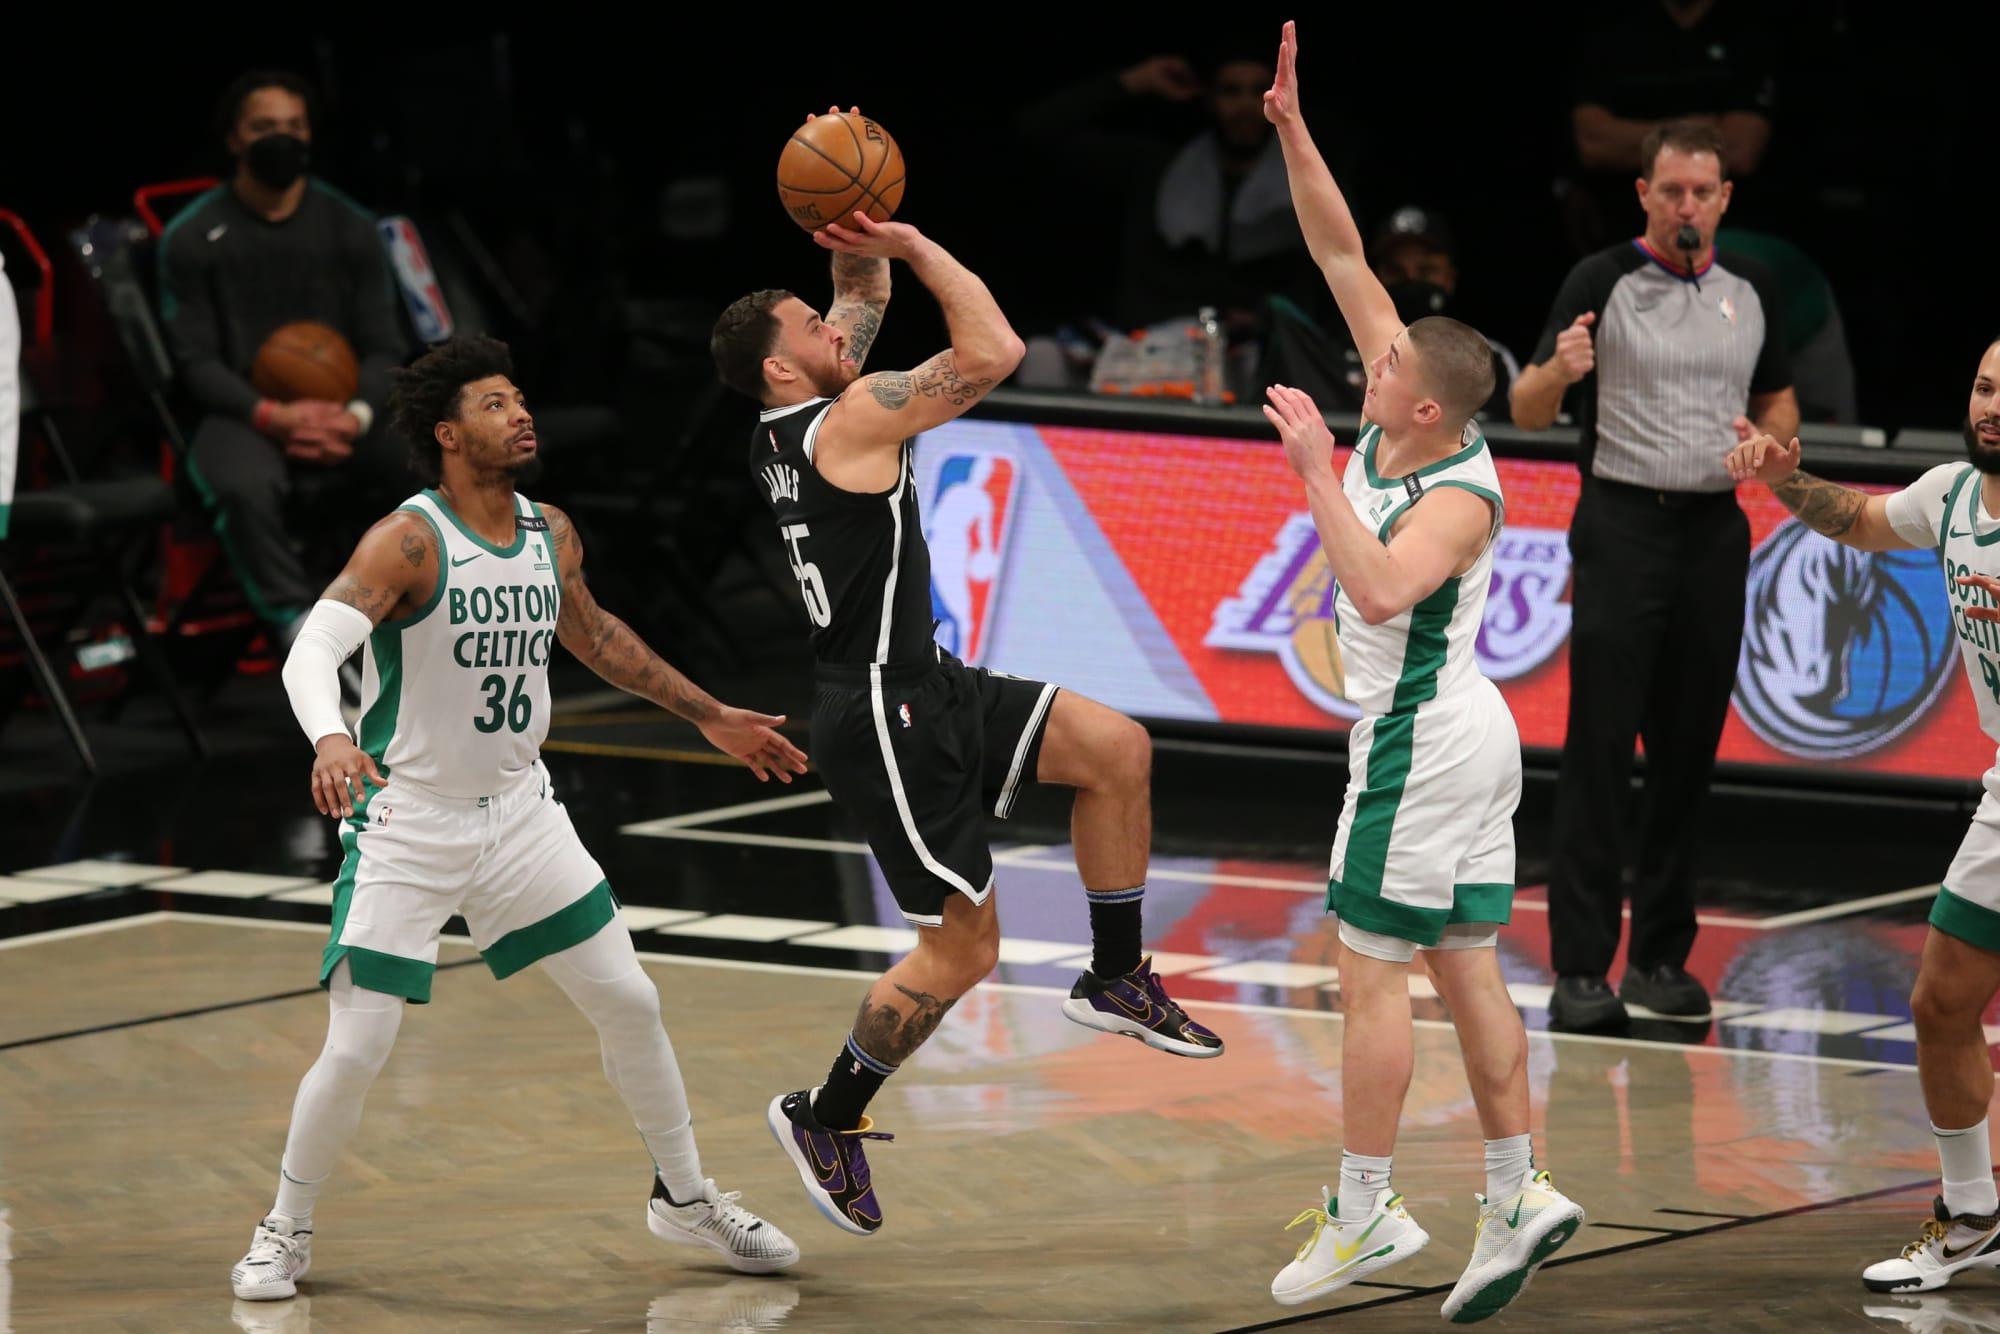 Boston Celtics: Who will be next All-Star Danny Ainge draft pick?